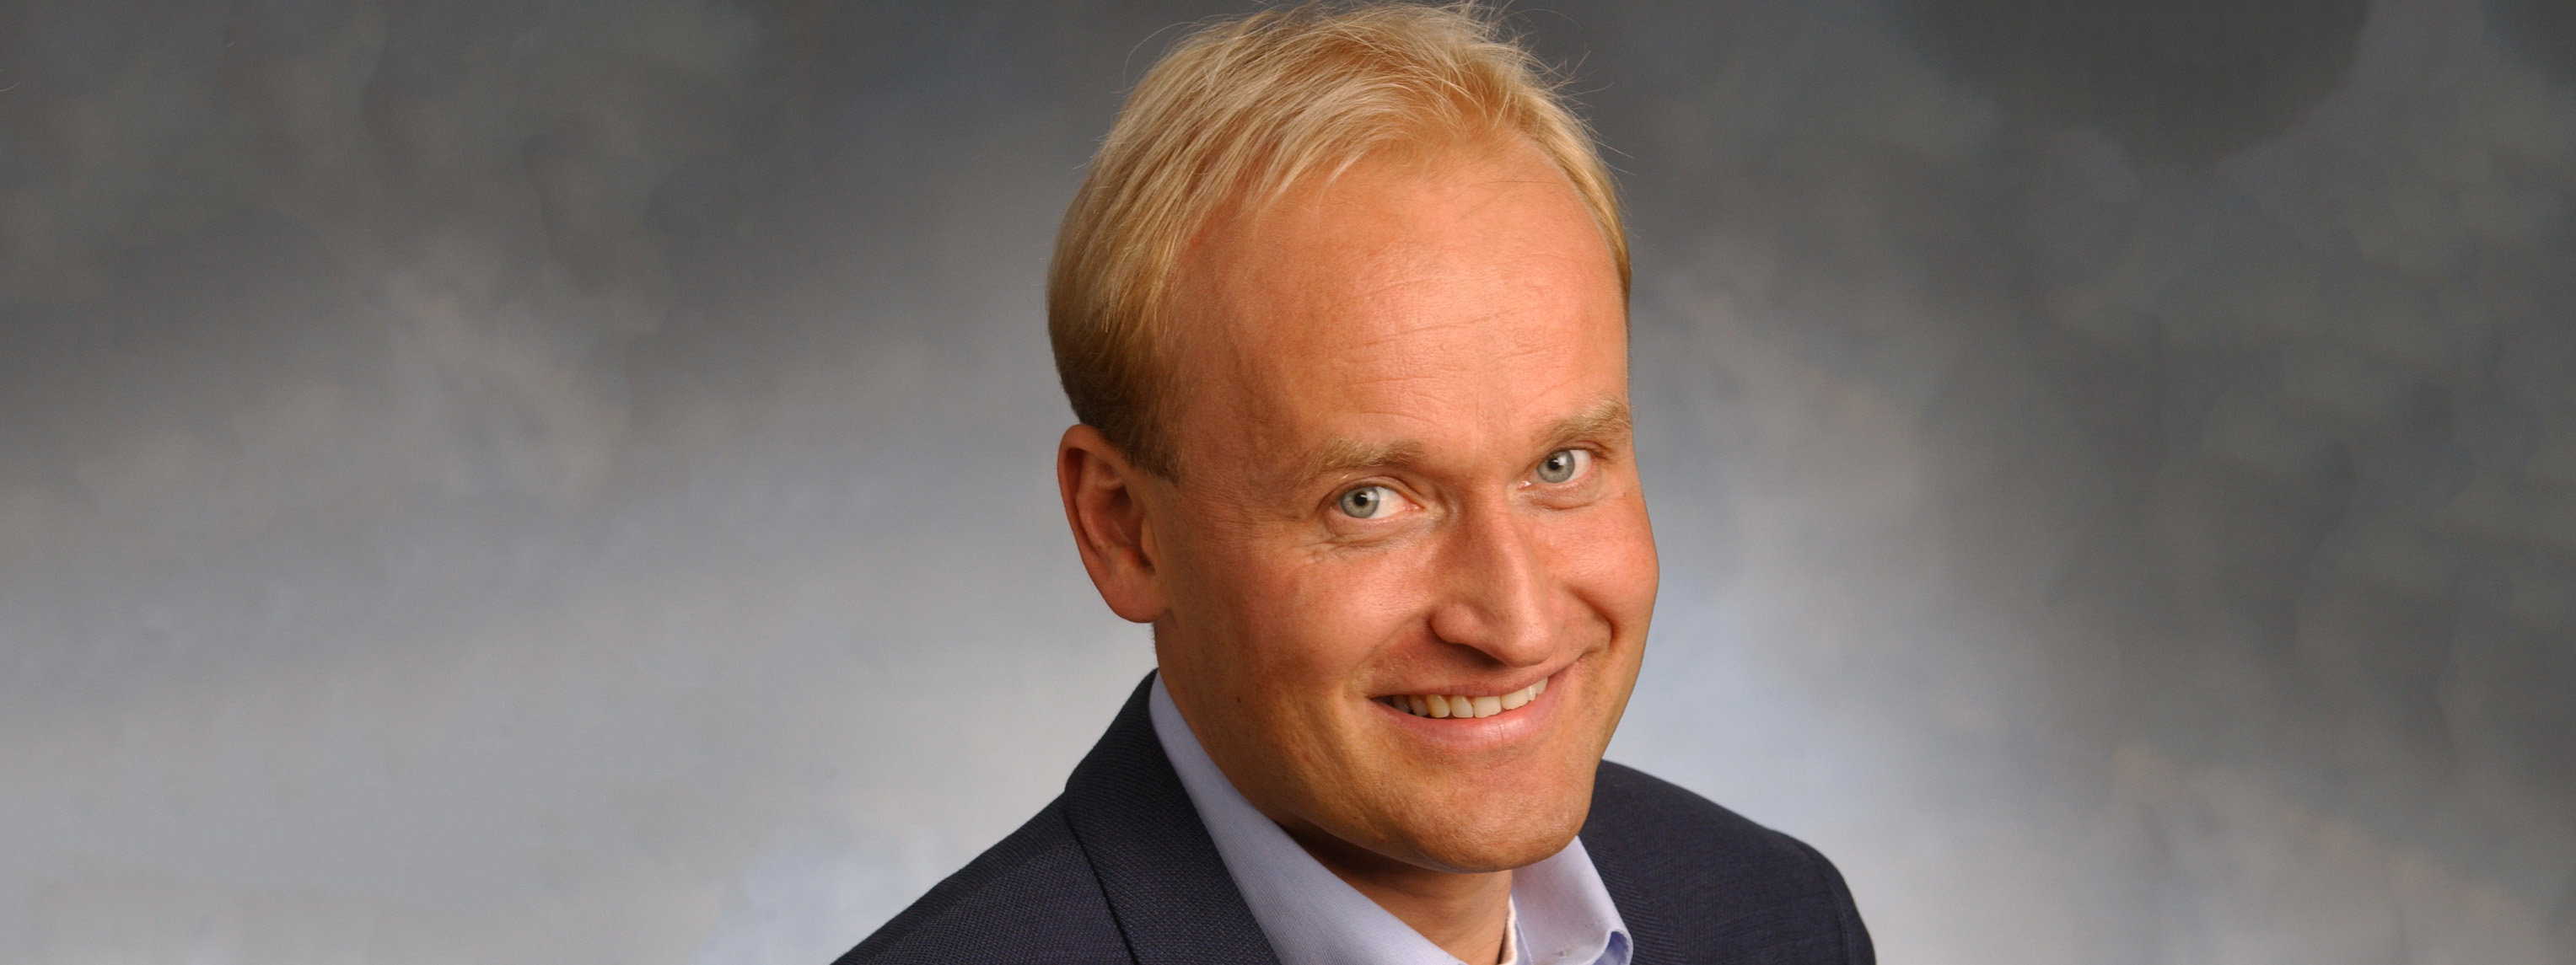 Janne Porkka